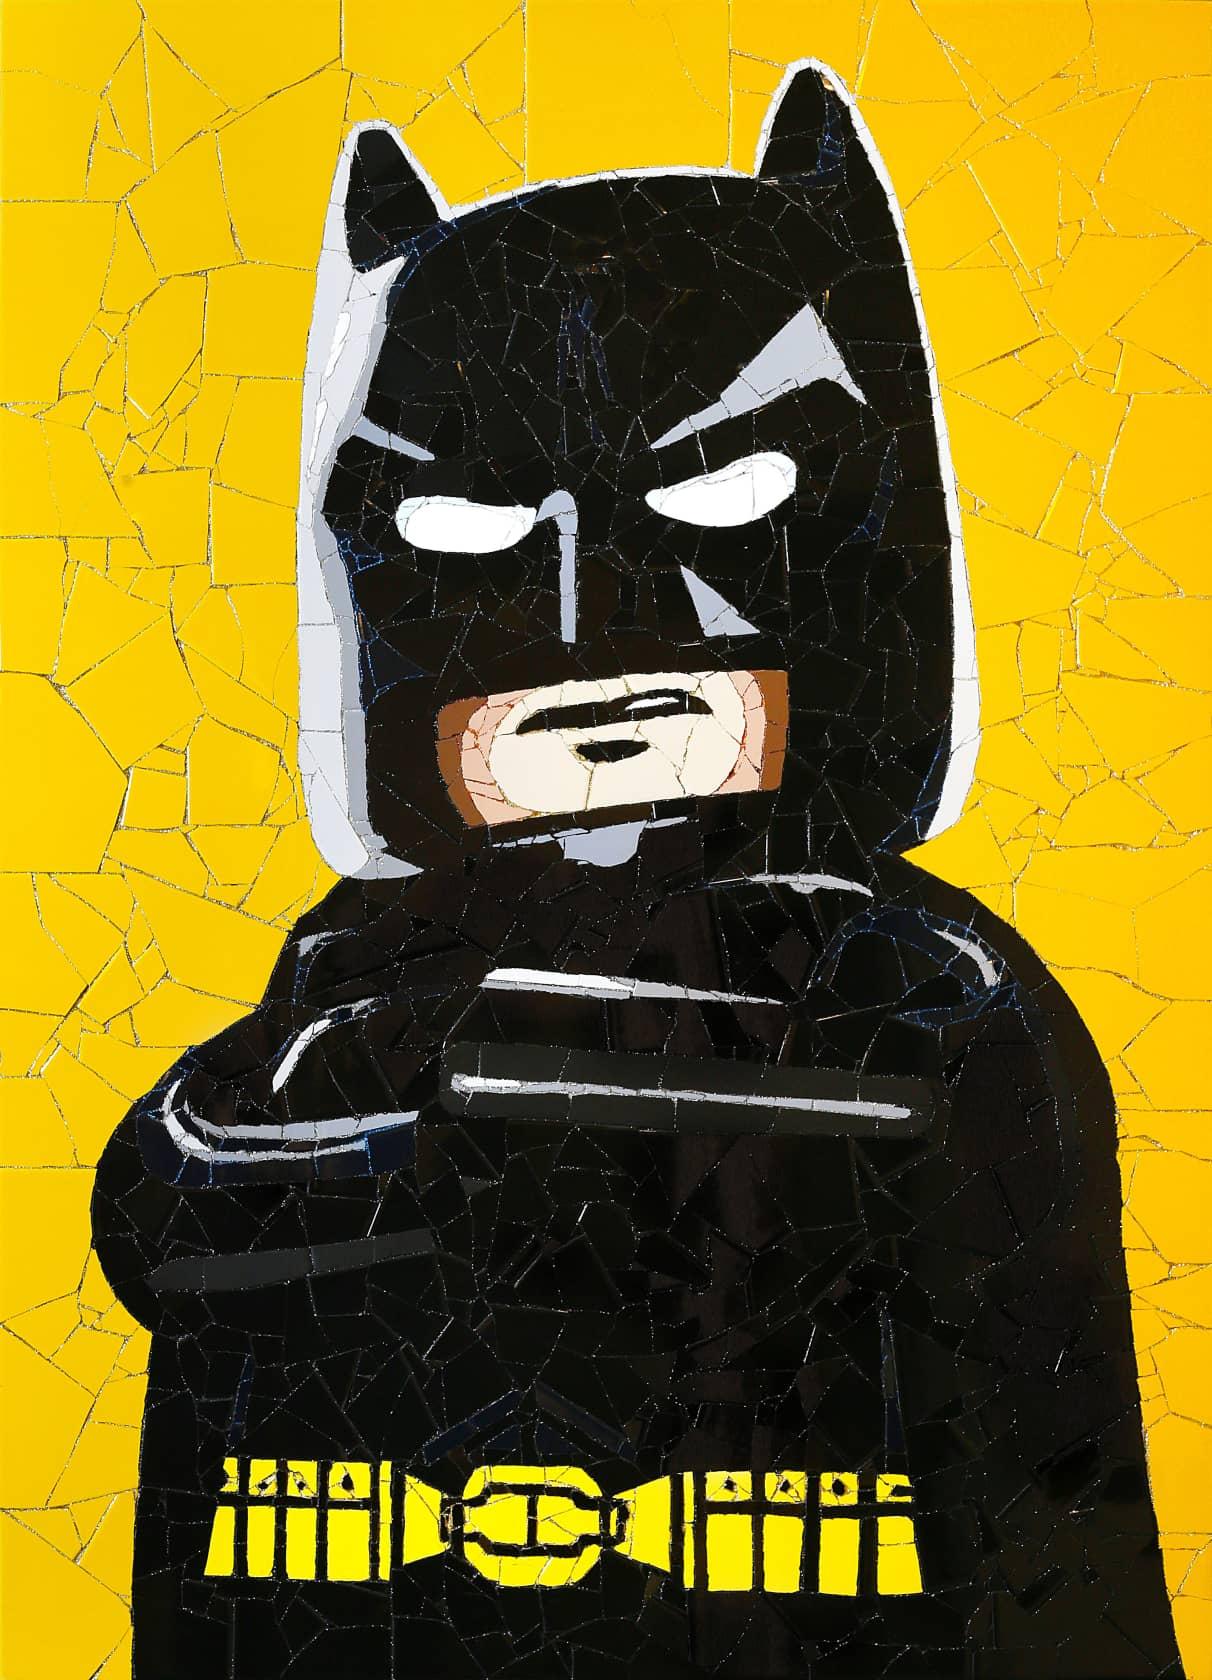 Jason Dussault, Batman, 2017